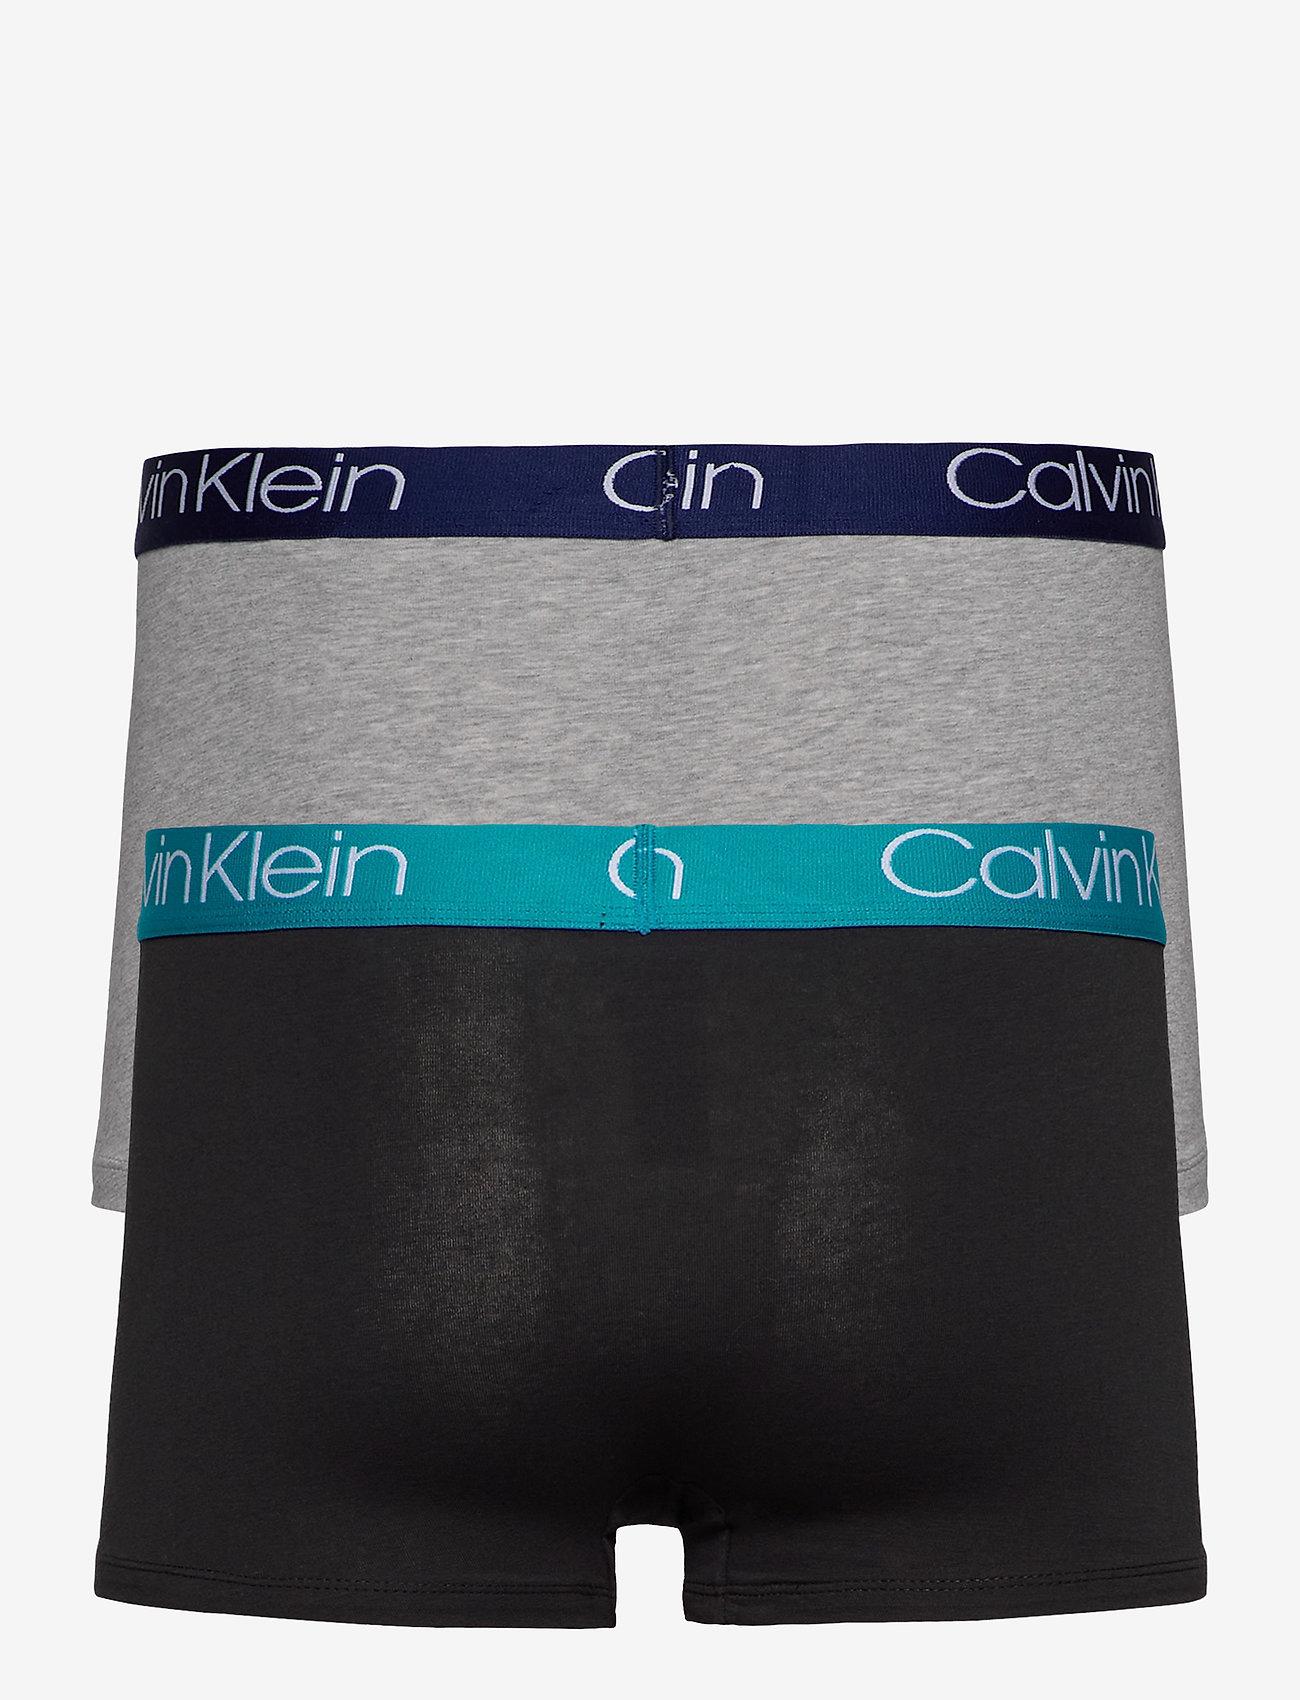 Calvin Klein - TRUNK 2PK - boxershorts - gh w/ horoscope, b w/ maldives - 1